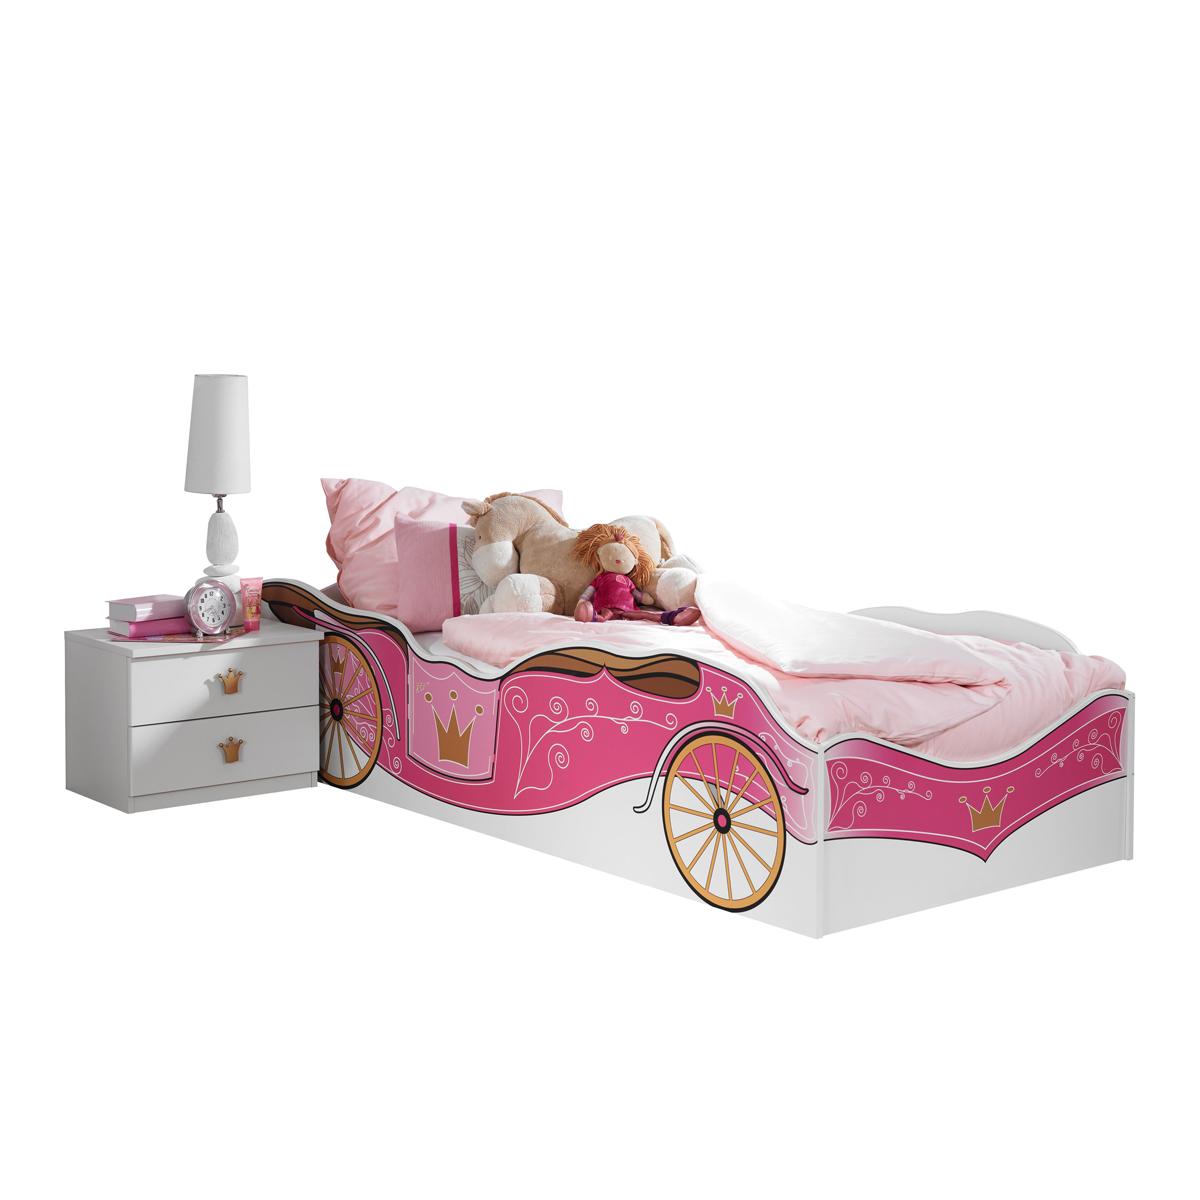 Full Size of Prinzessinen Bett Rauch Packs Kate In Alpinwei Mit Absetzung Printdekor Prinzessin Betten Für Teenager Platzsparend Bambus 120x200 Bettkasten Stapelbar Bett Prinzessinen Bett